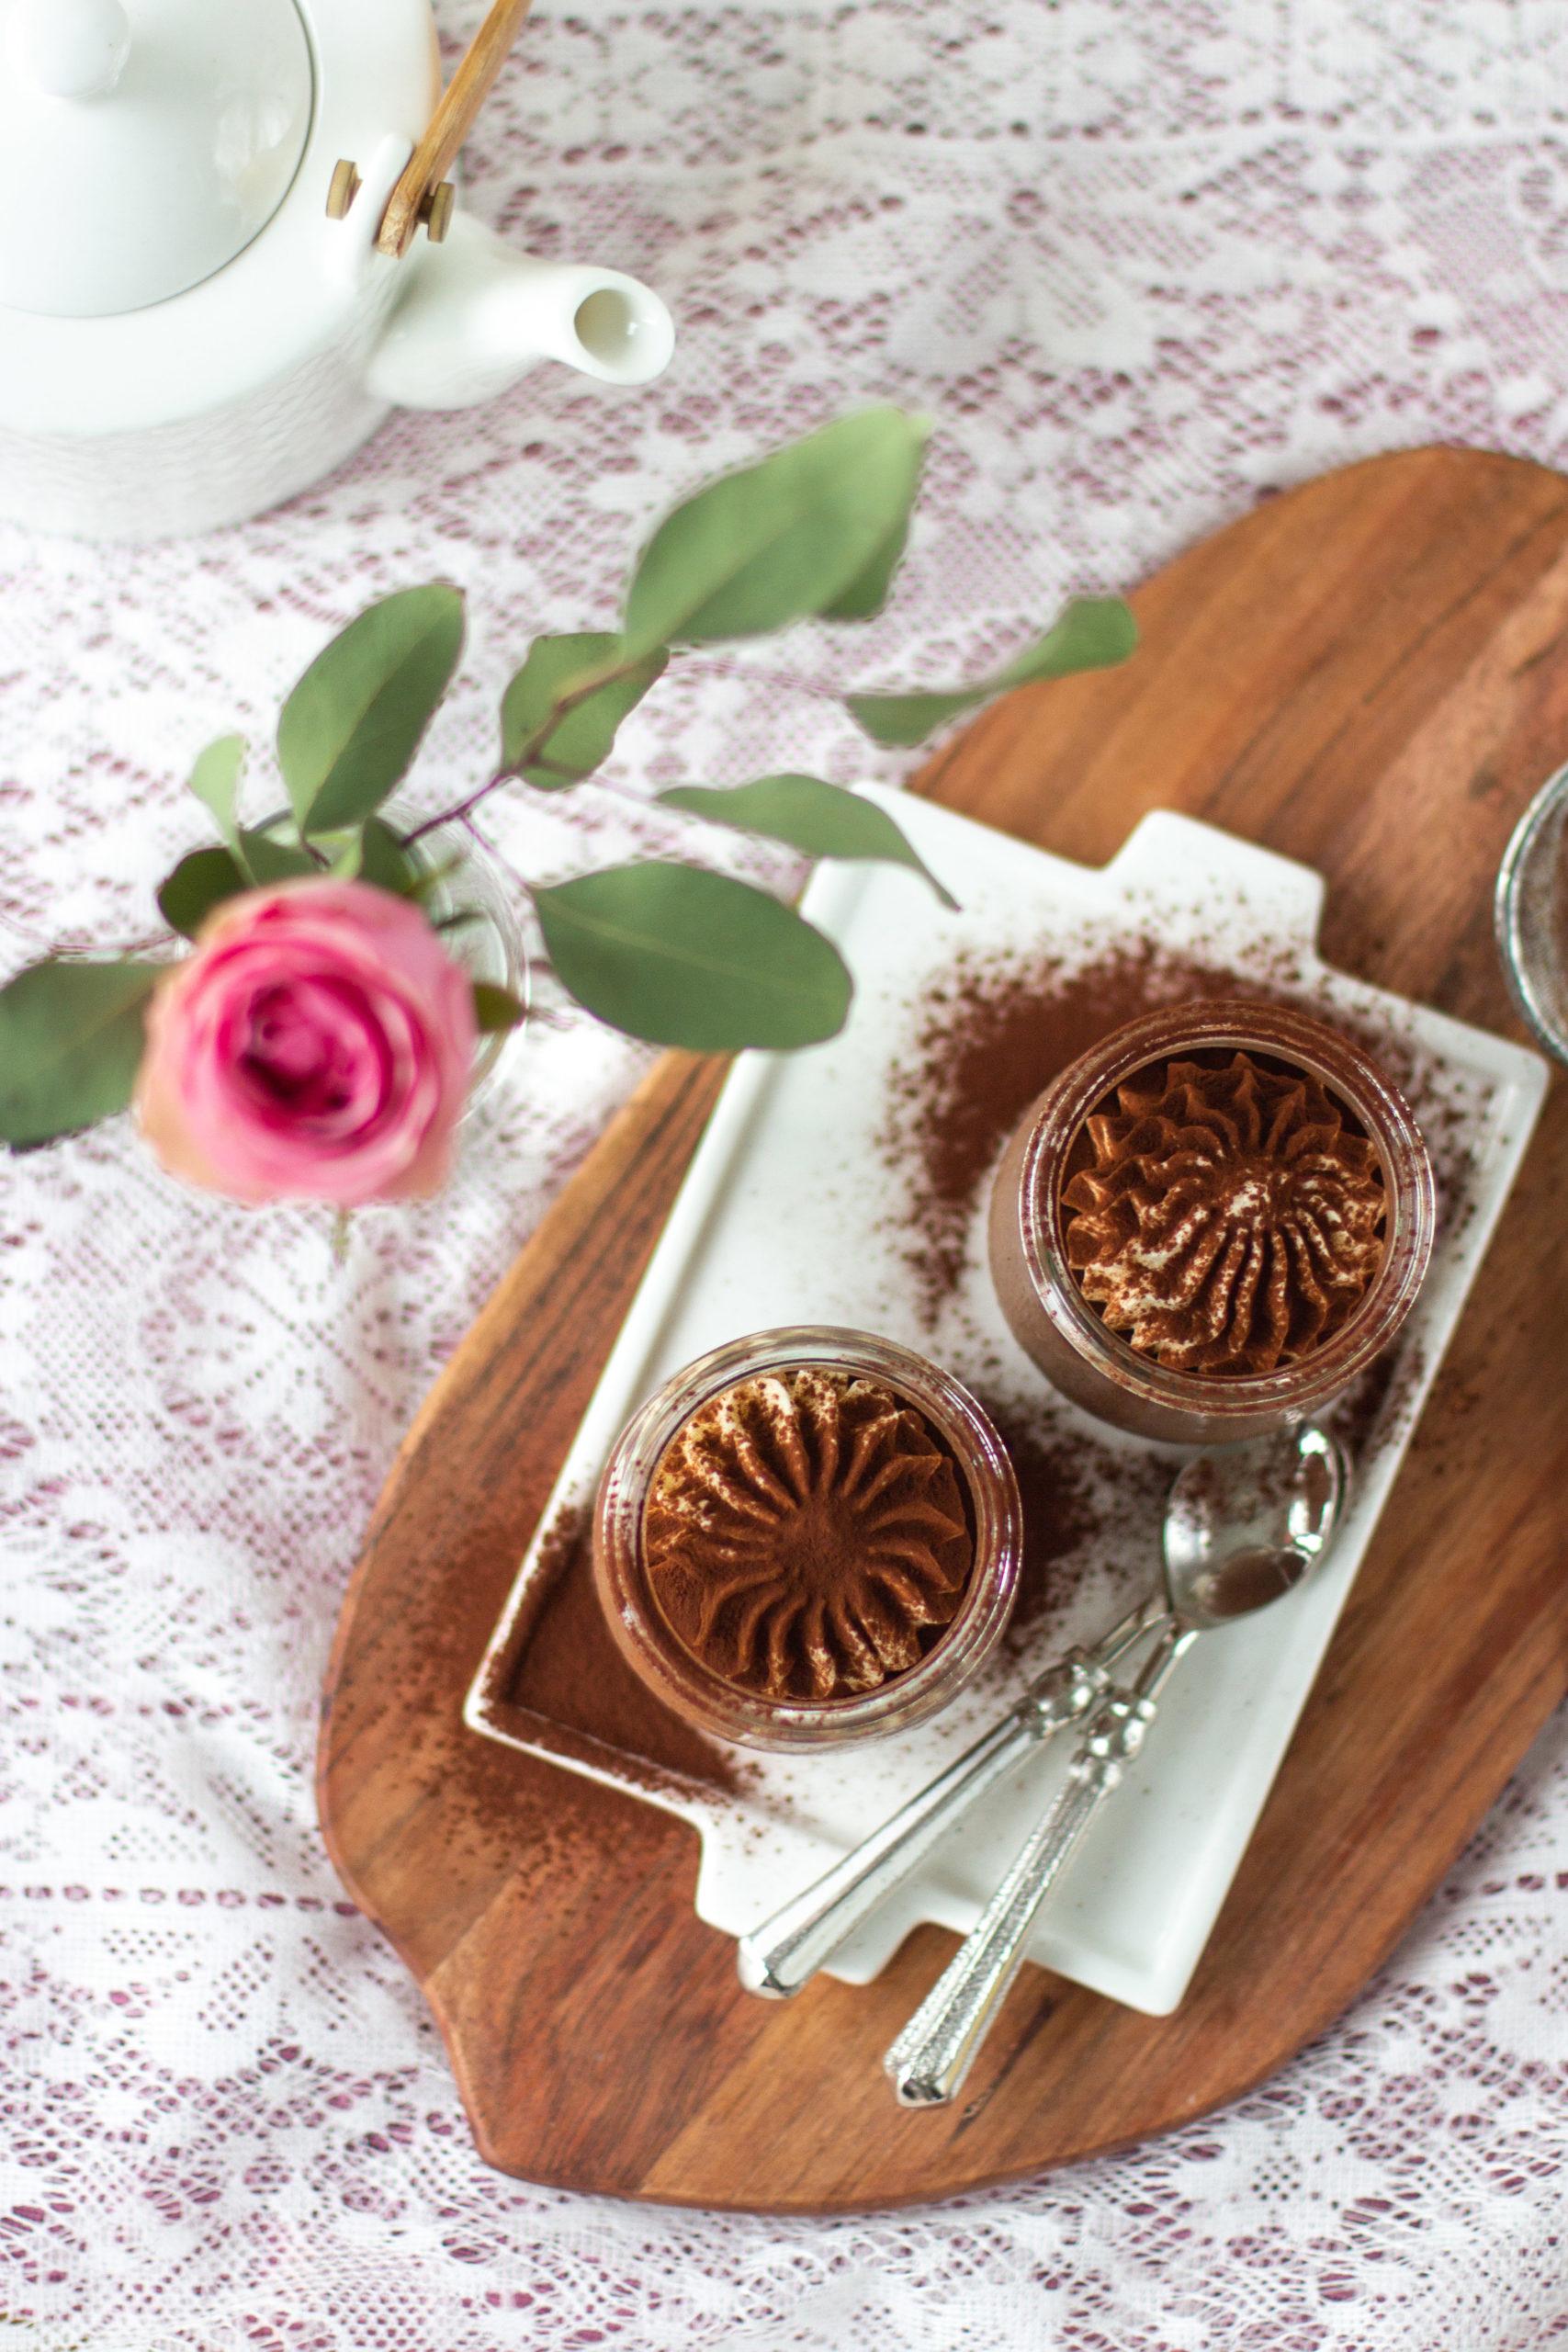 Chocolate panna cotta dessert with whipped cream and coca powder